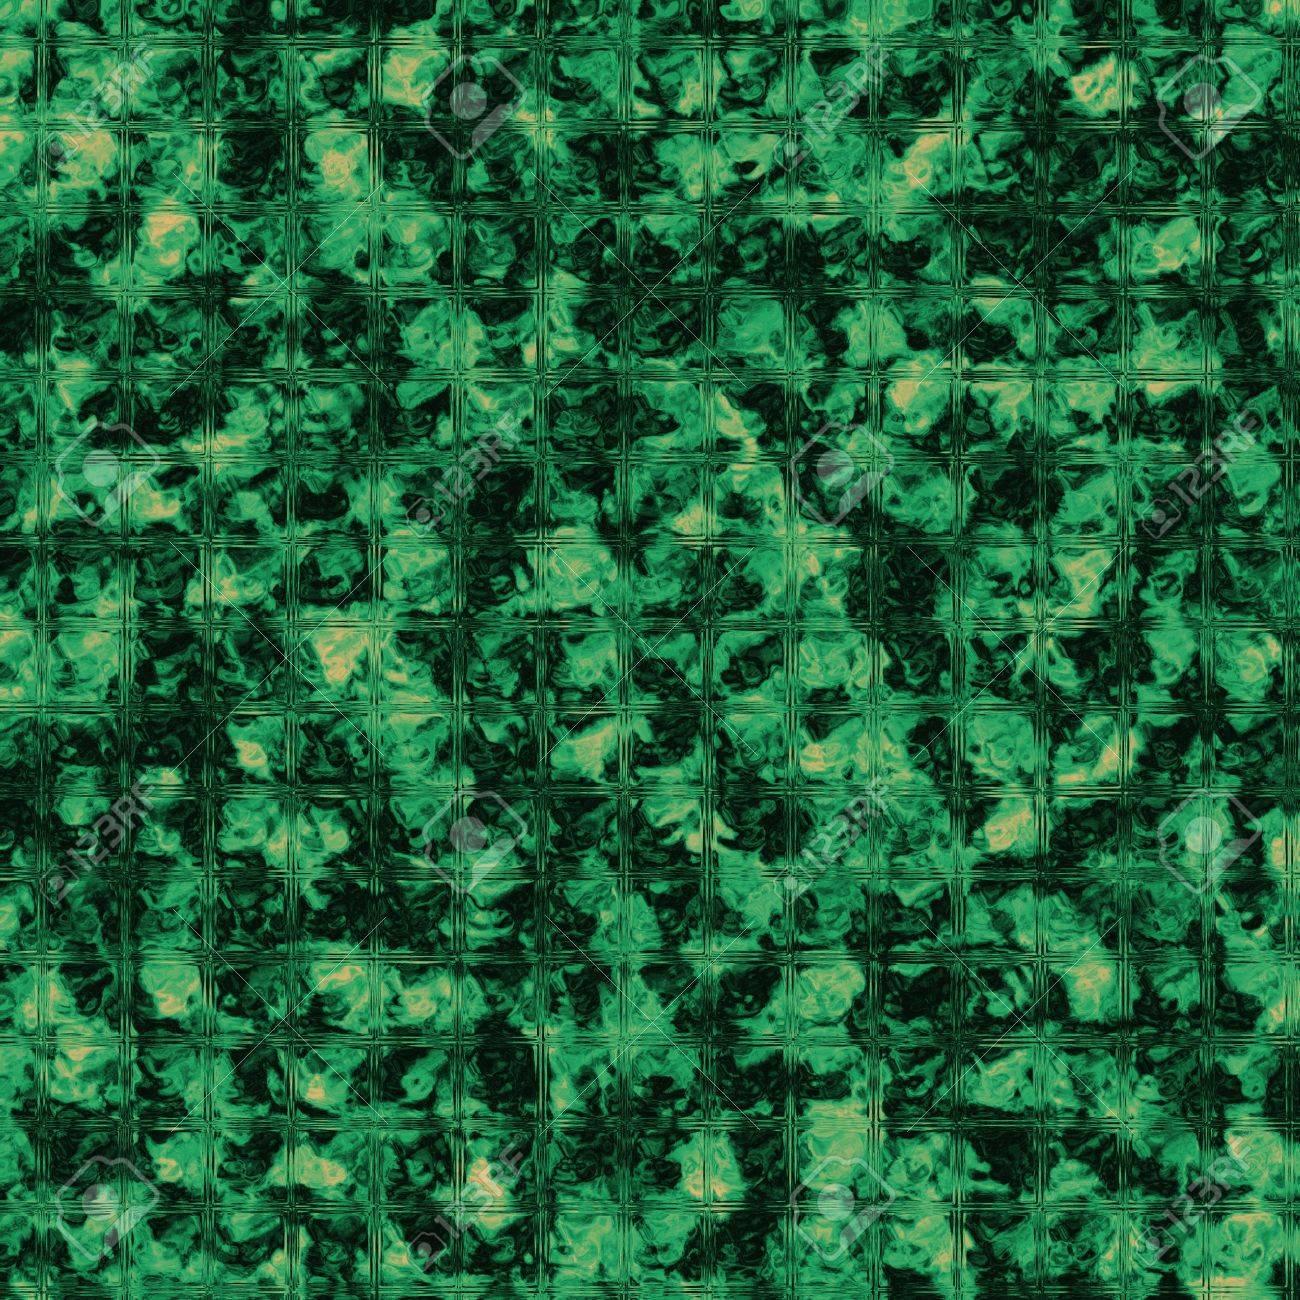 Green tiles kitchen texture - Green Glass Tiles Texture Background Kitchen Or Bathroom Concept Stock Photo 12343815